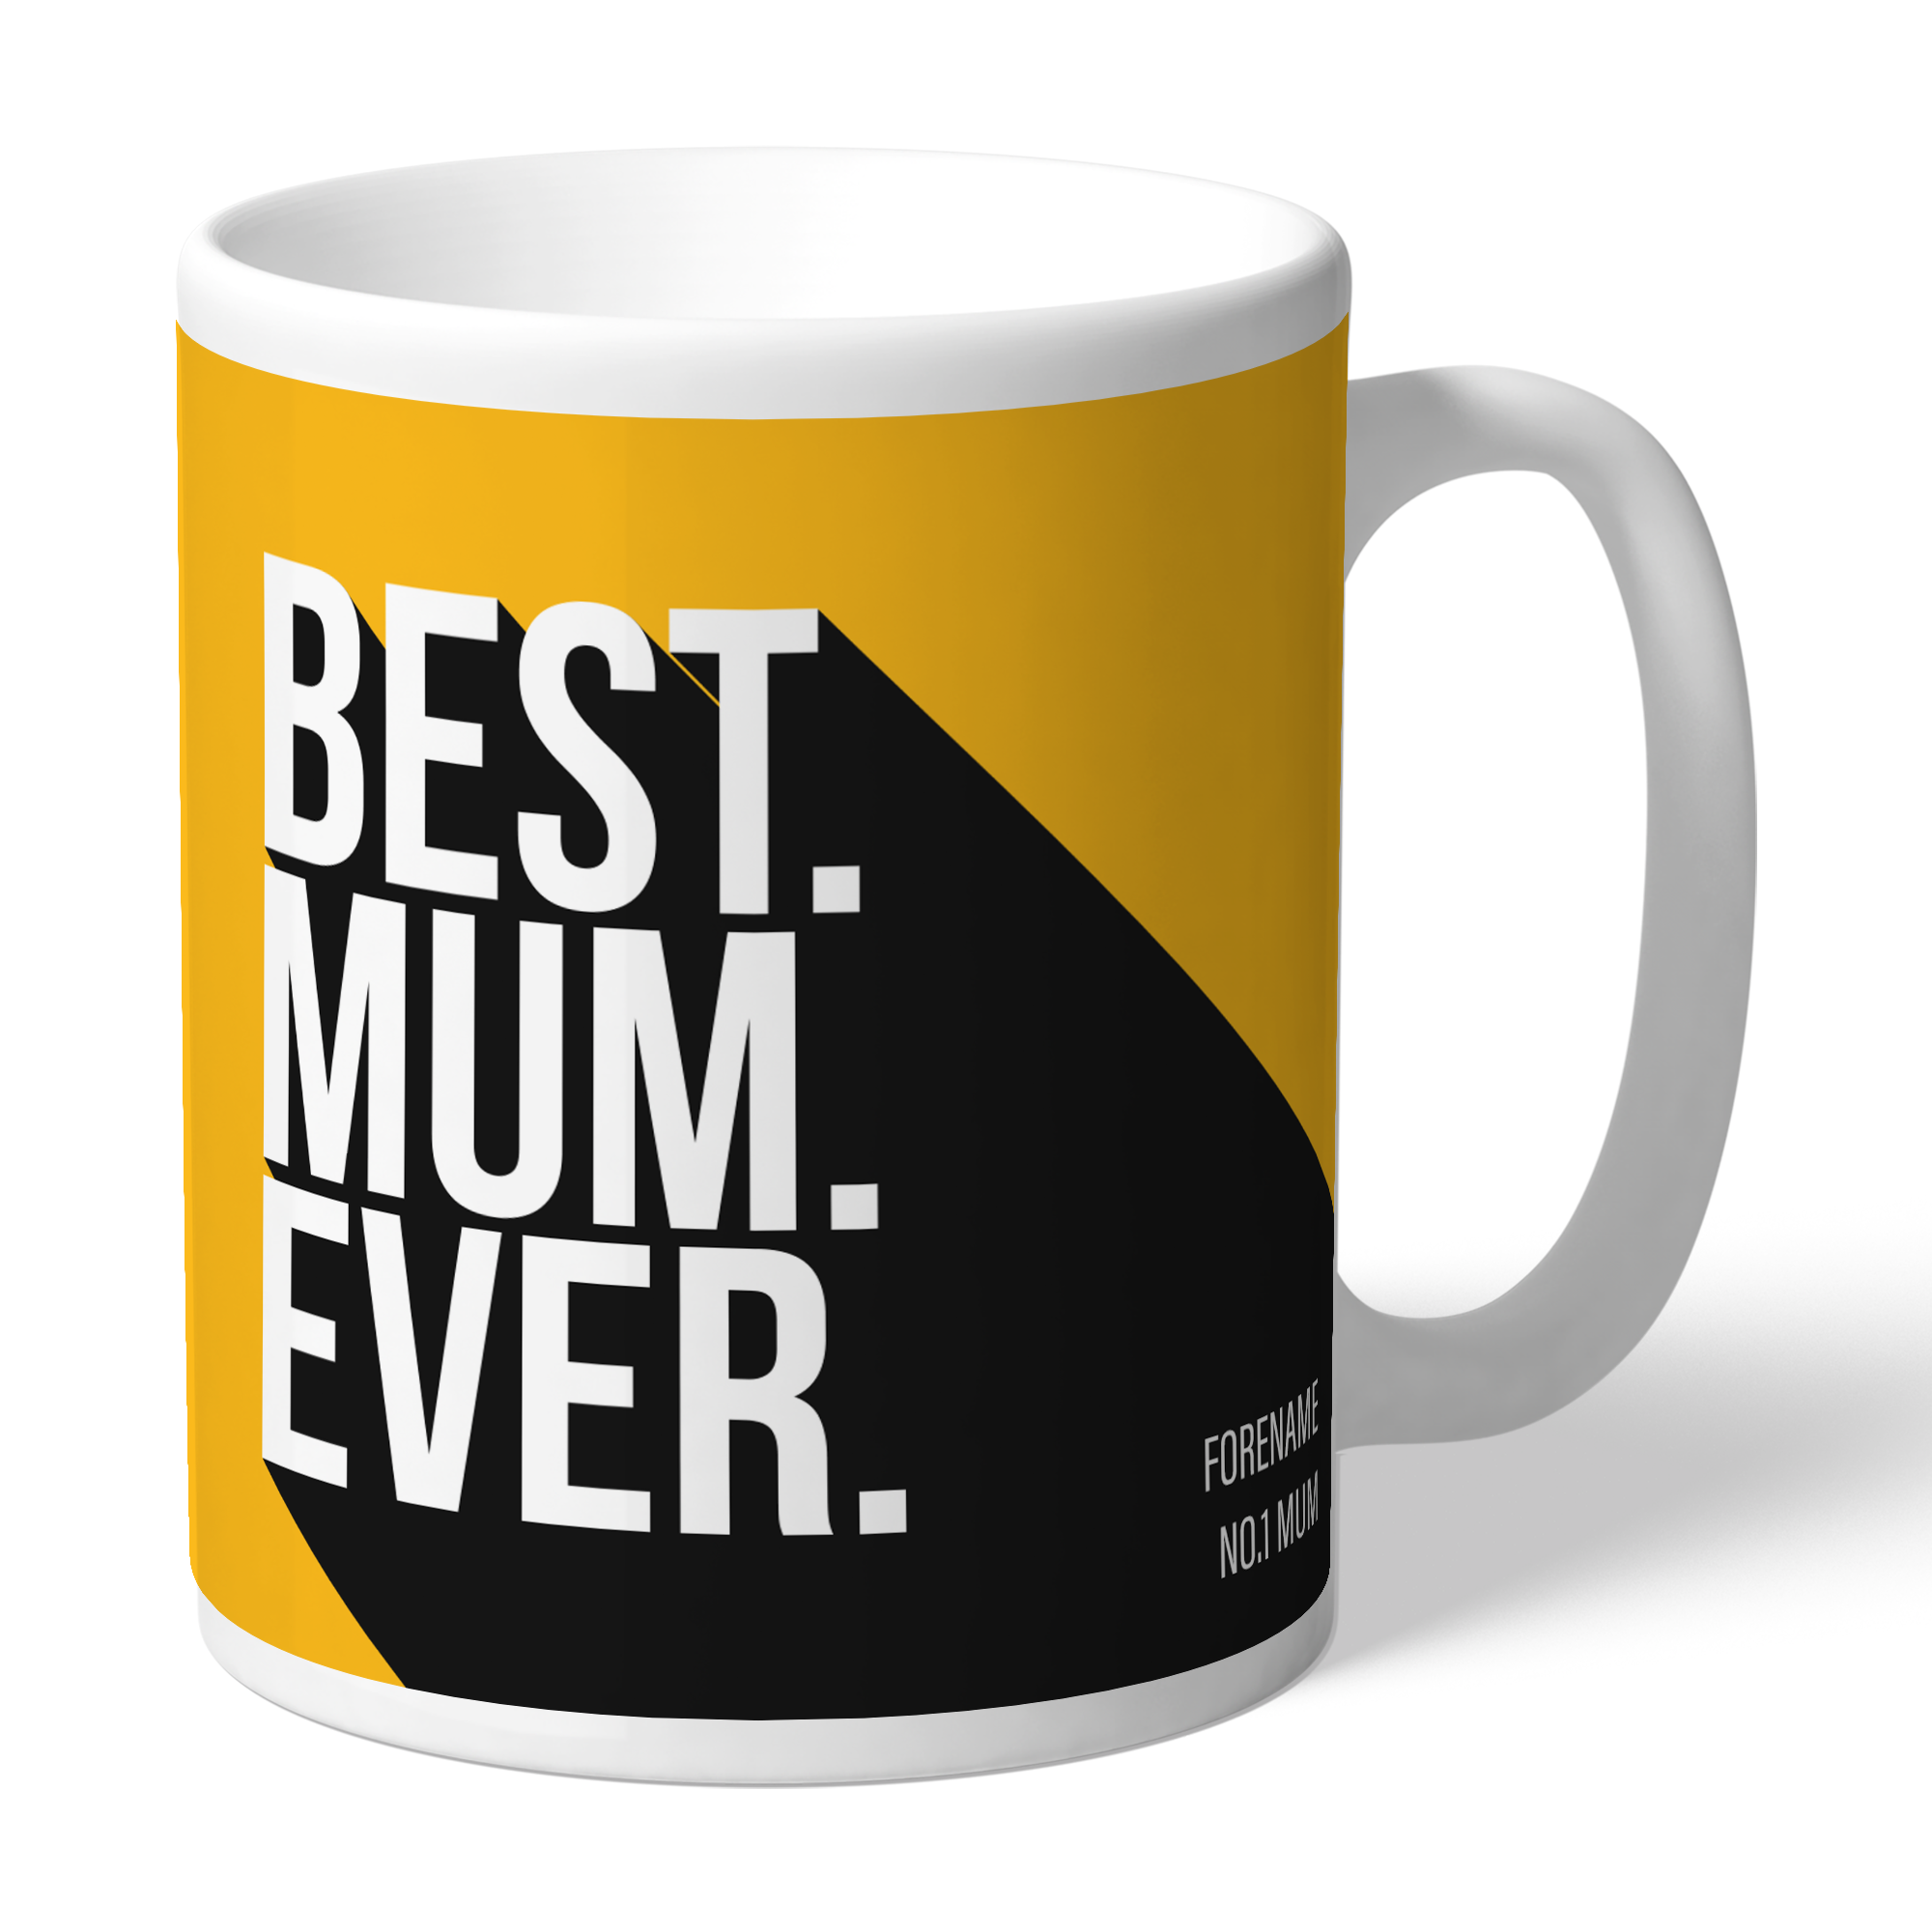 Wolverhampton Wanderers Best Mum Ever Mug